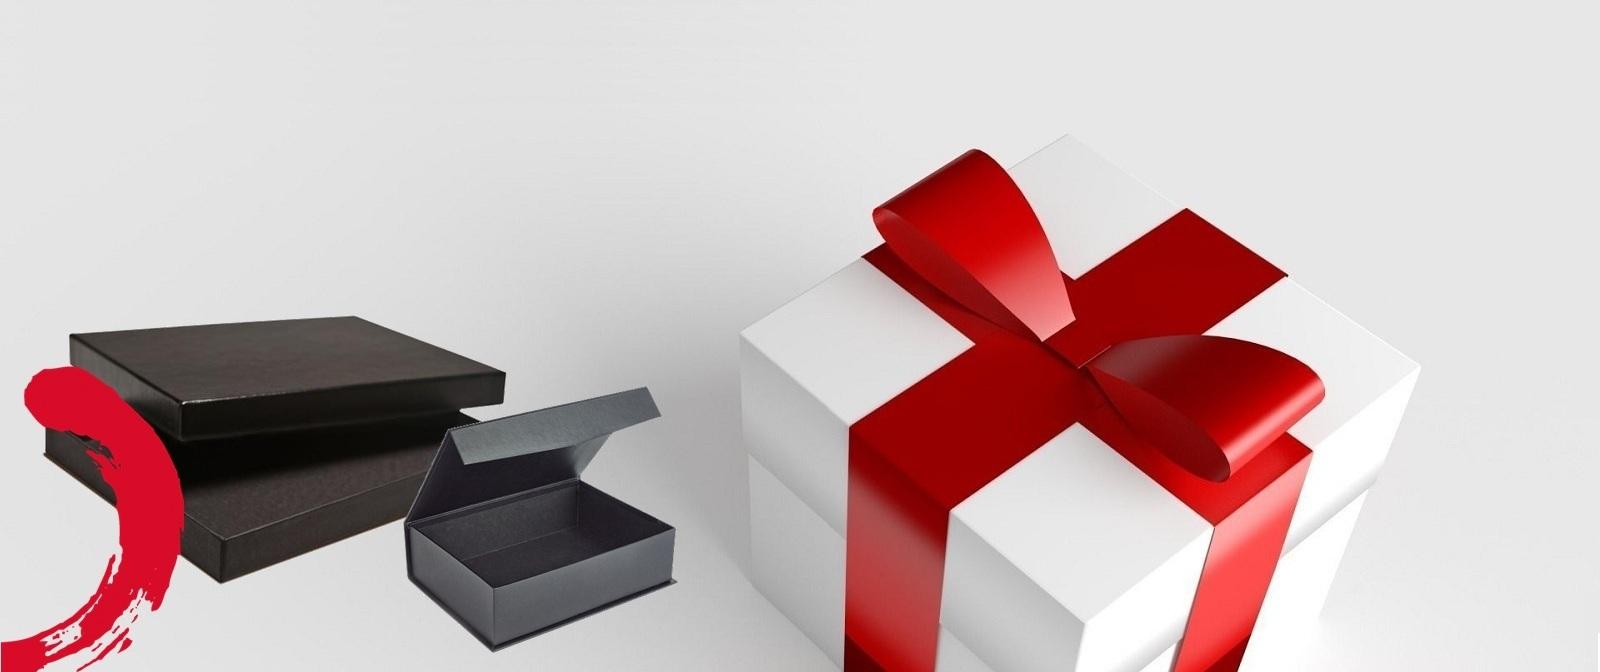 BOXANDART-BOX-AND-ART-PACKAGE-BOXES-κουτια τιμές, κουτιά τιμές, χειροποίητα κουτιά, χειροποιητα κουτια, χαρτινα κουτια, χάρτινα κουτιά, κουτιά συσκευασίας, κουτια συσκευασιας